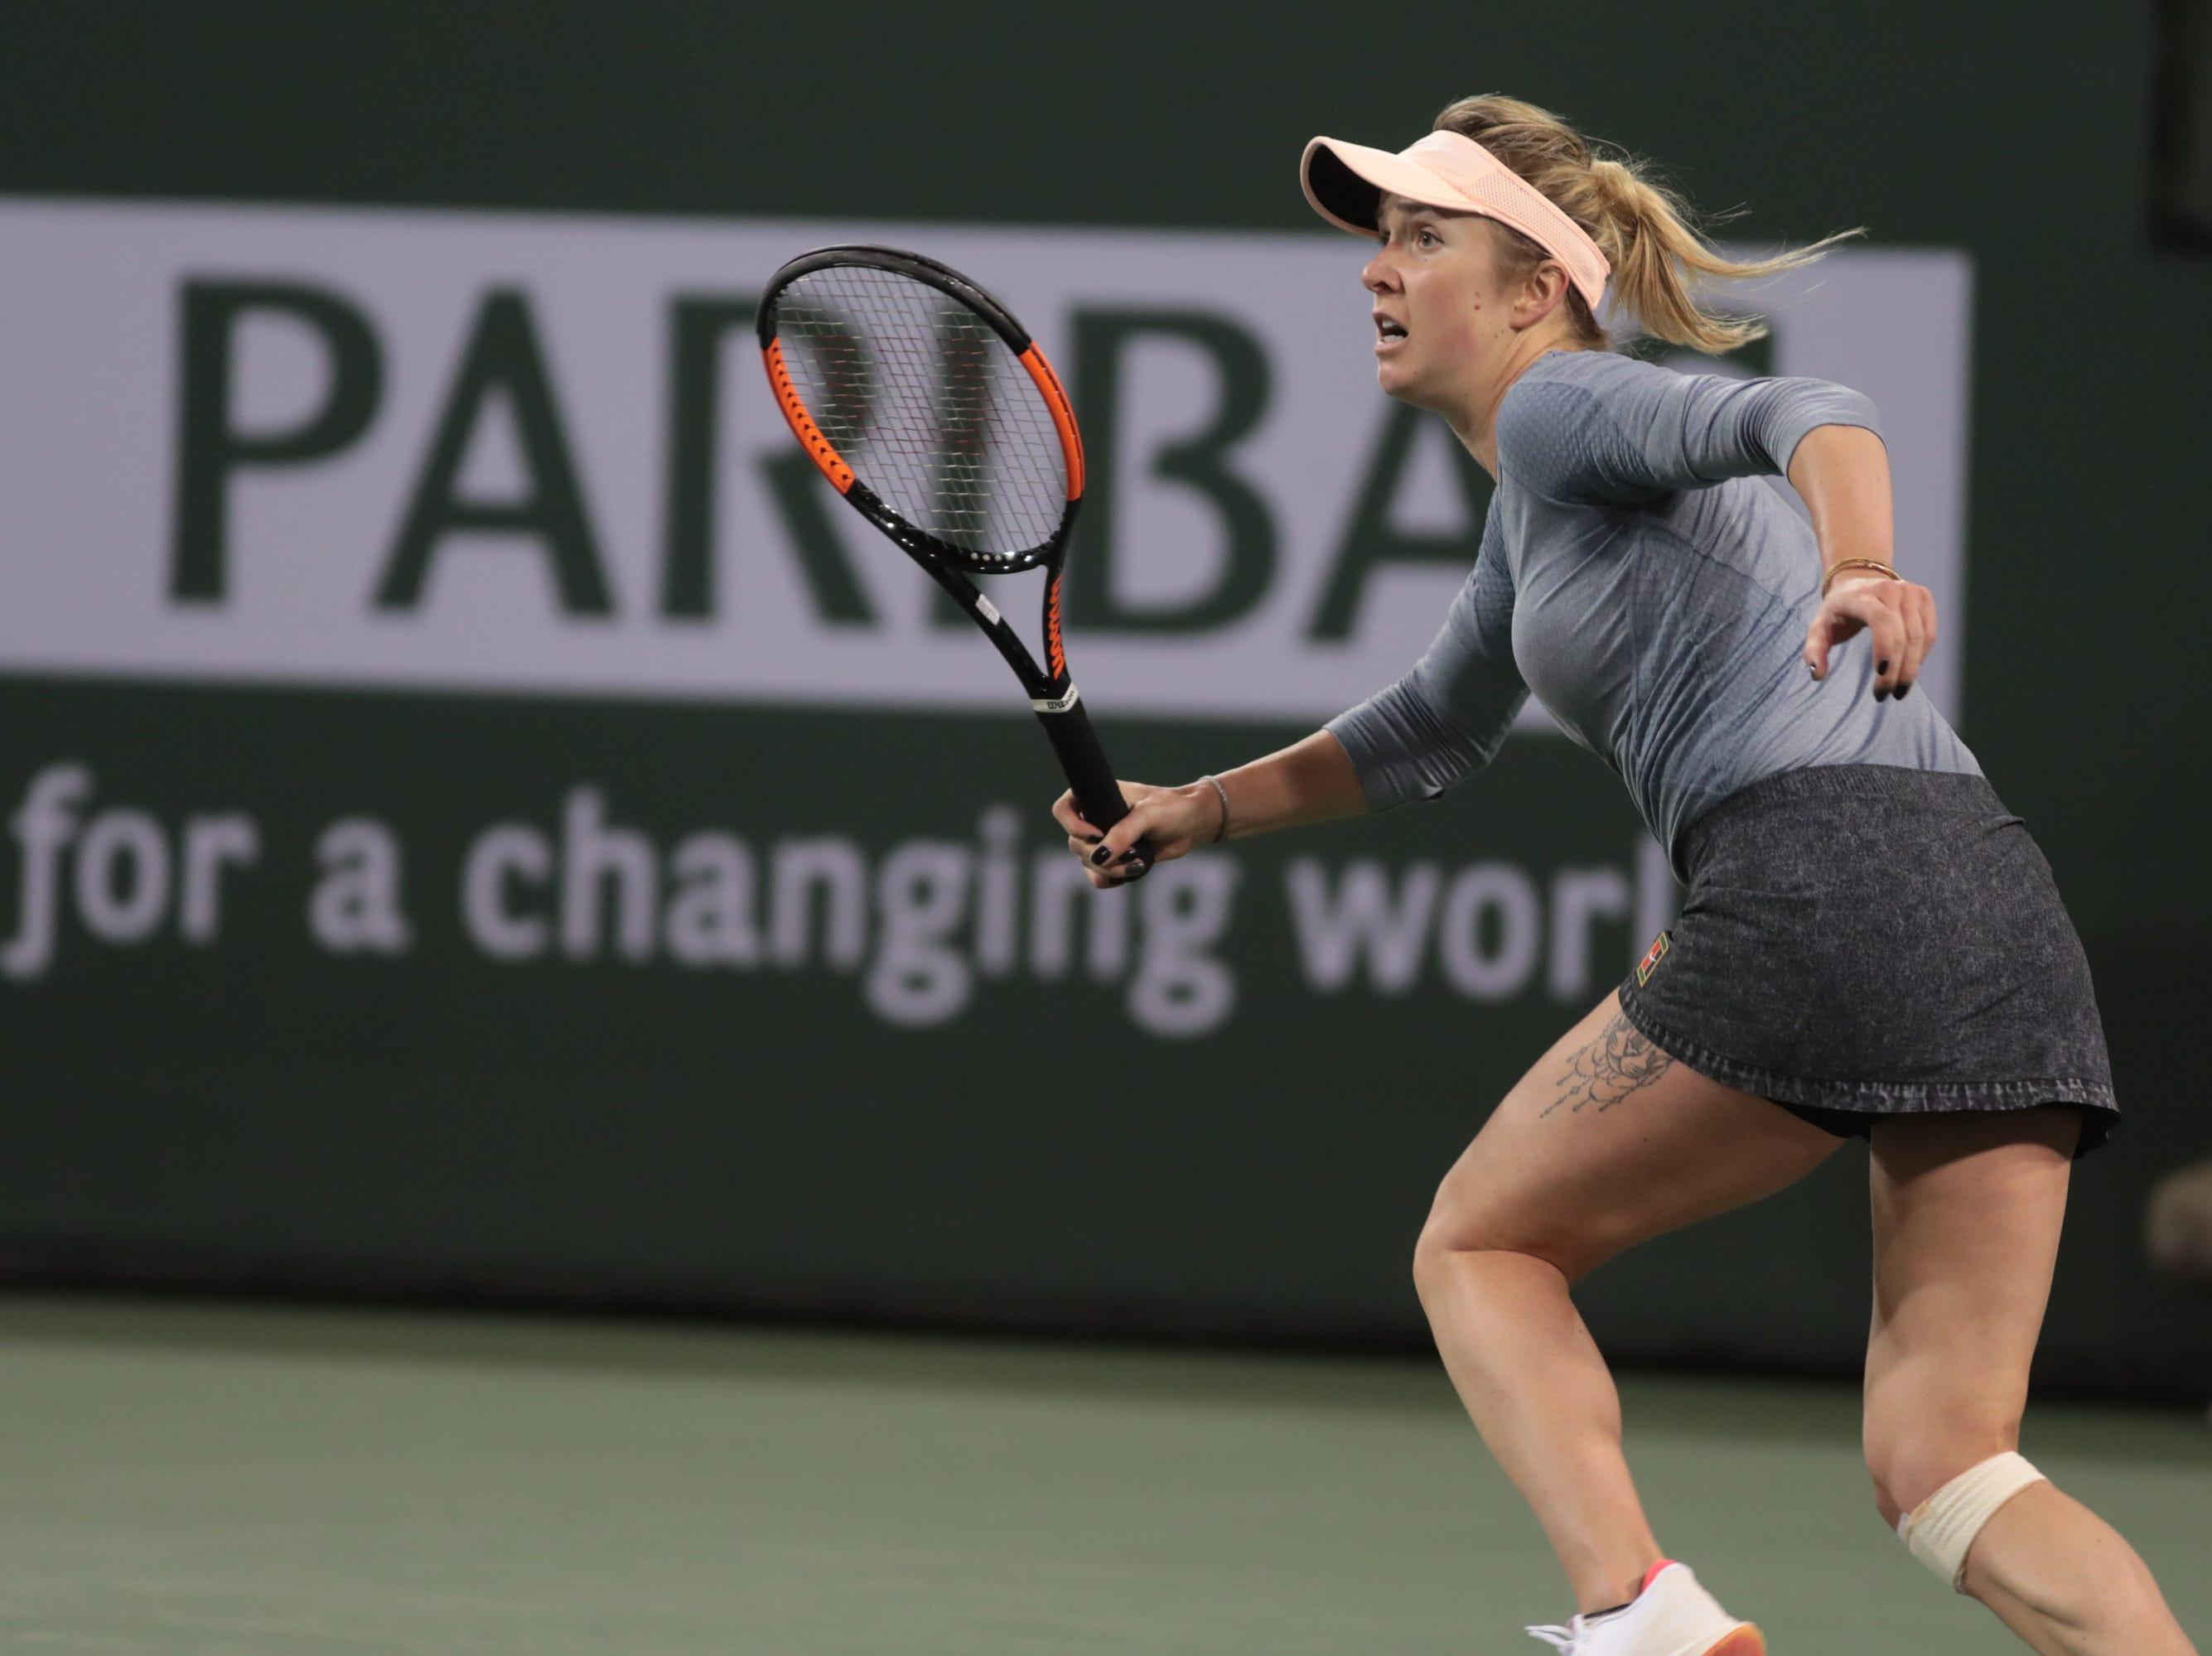 Elina Svitolina runs down a shot from Marketa Vondrousova in her quarterfinal match at the BNP Paribas Open in Indian Wells, Calif., March 13, 2019.